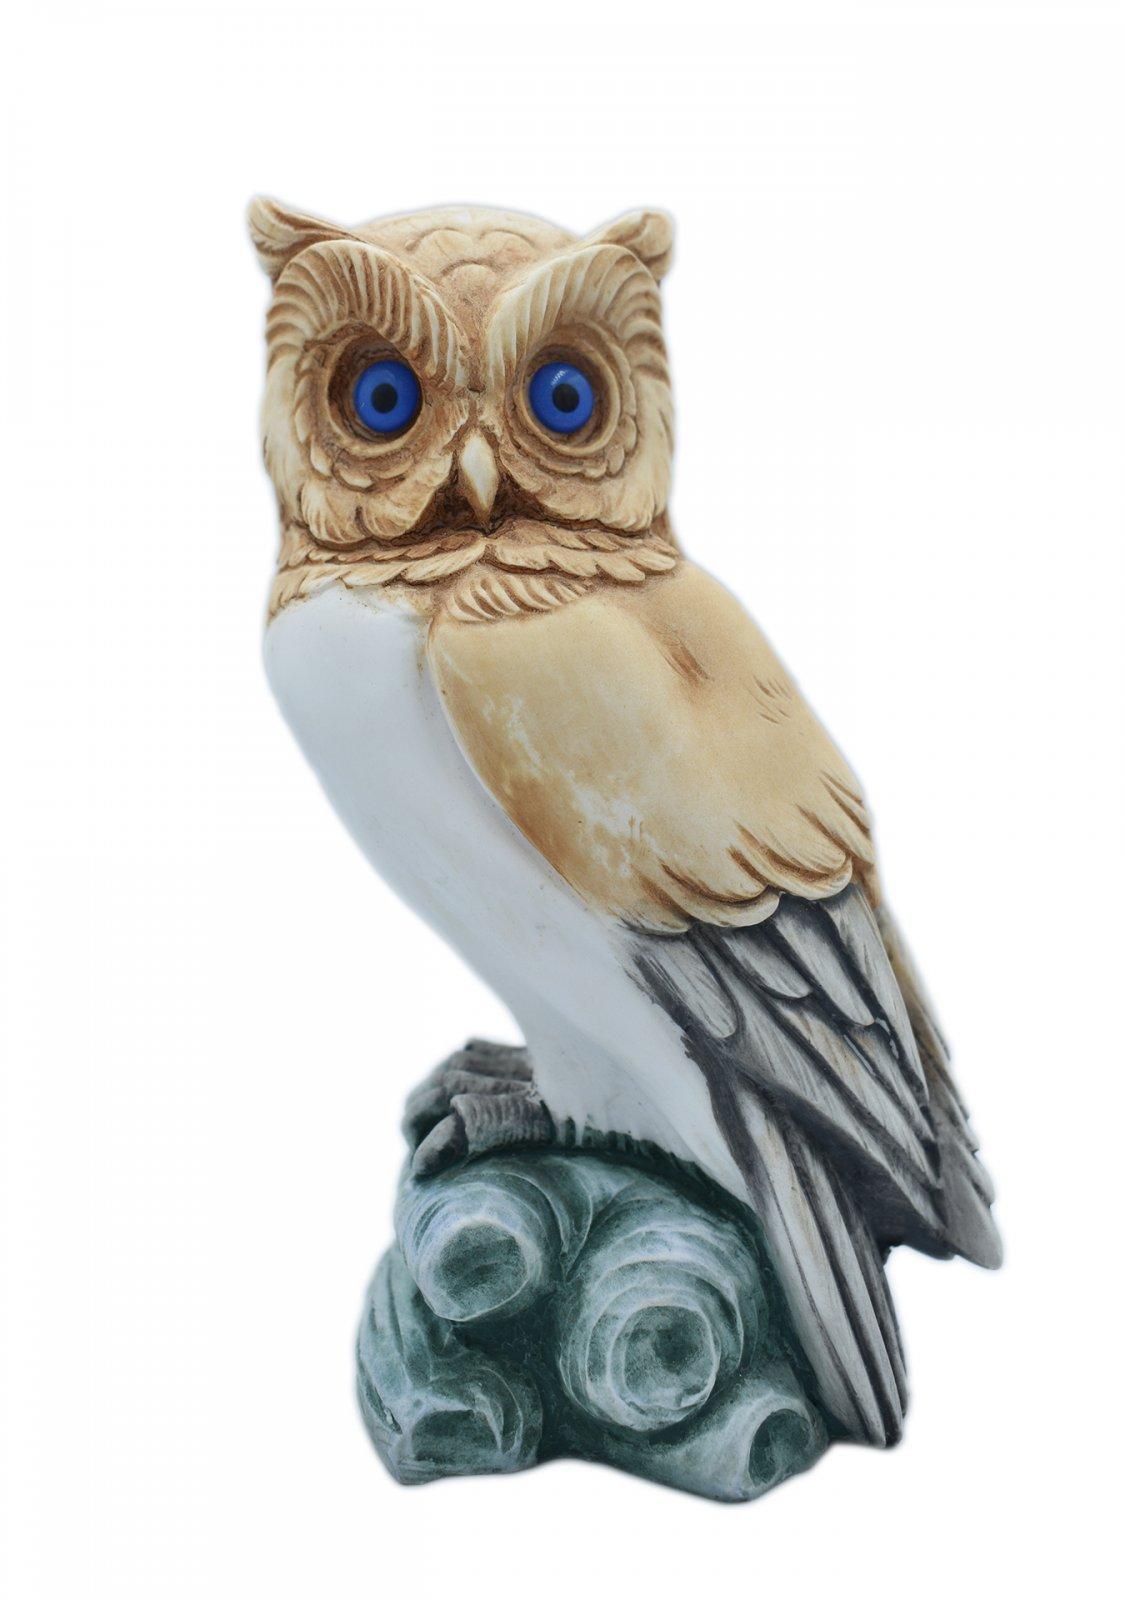 Owl medium alabaster statue with color, the symbol of wisdom